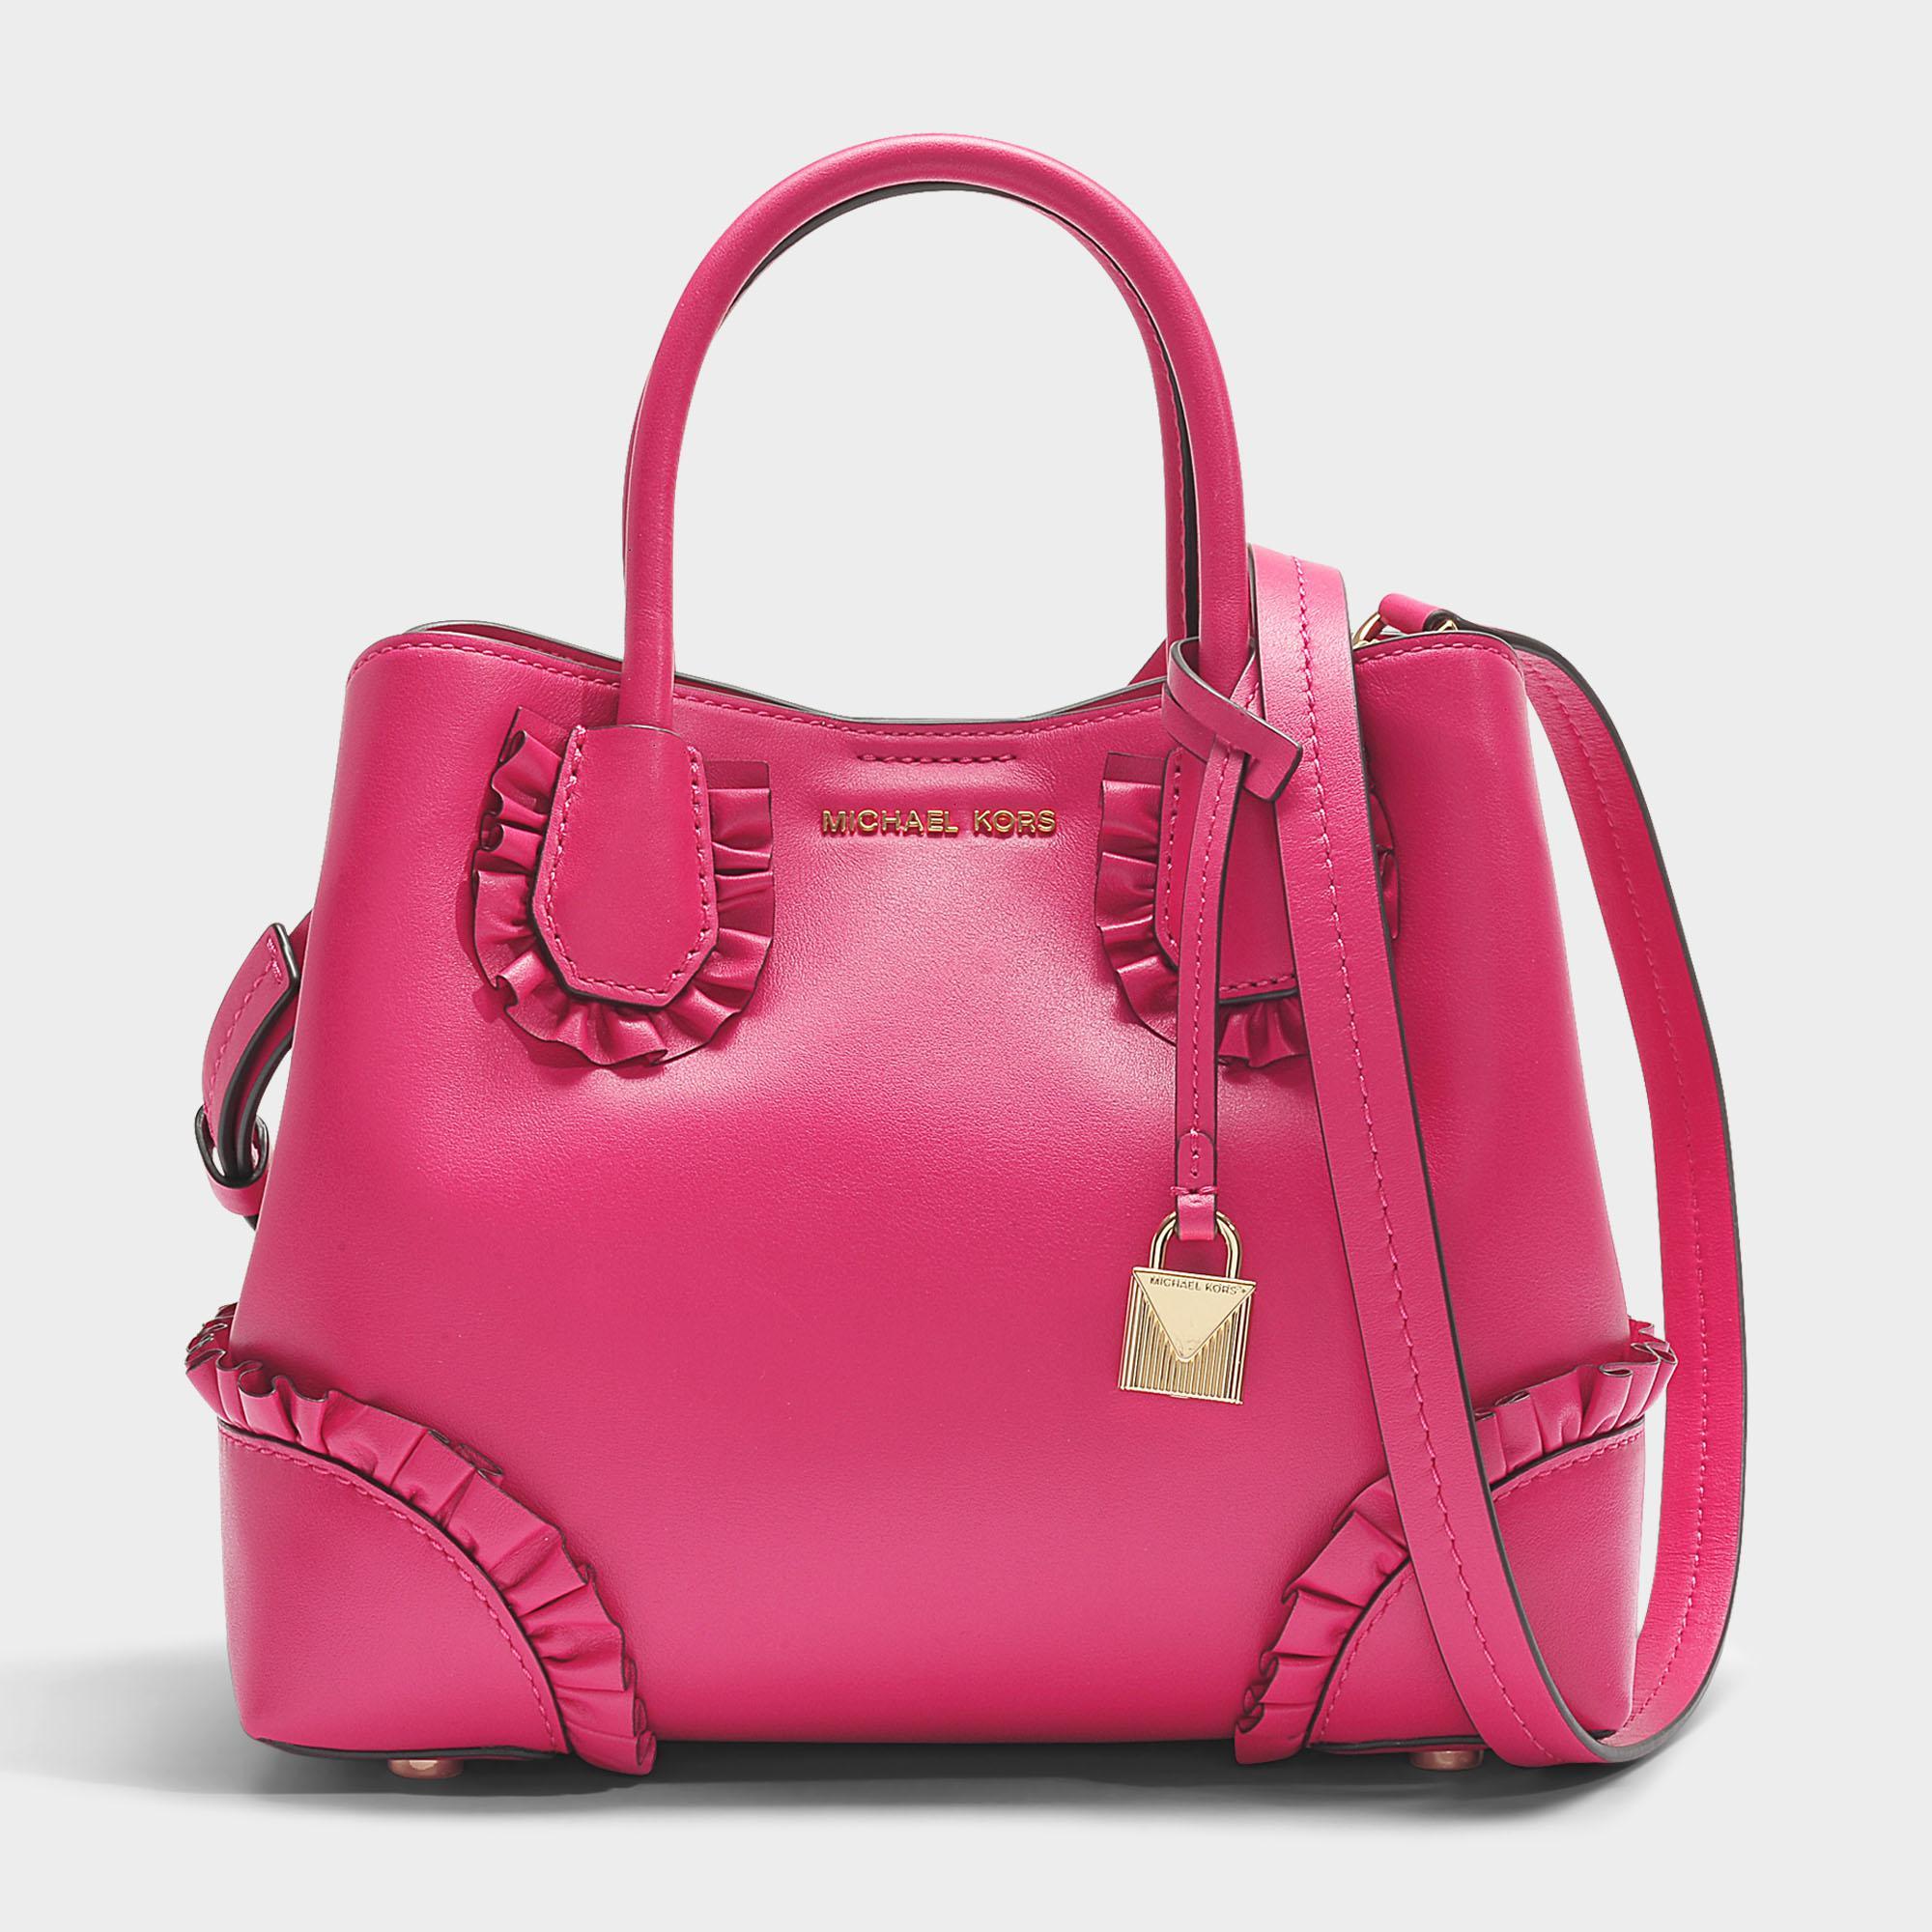 michael michael kors mercer gallery small center zip satchel bag in ultra pink polisher leather. Black Bedroom Furniture Sets. Home Design Ideas